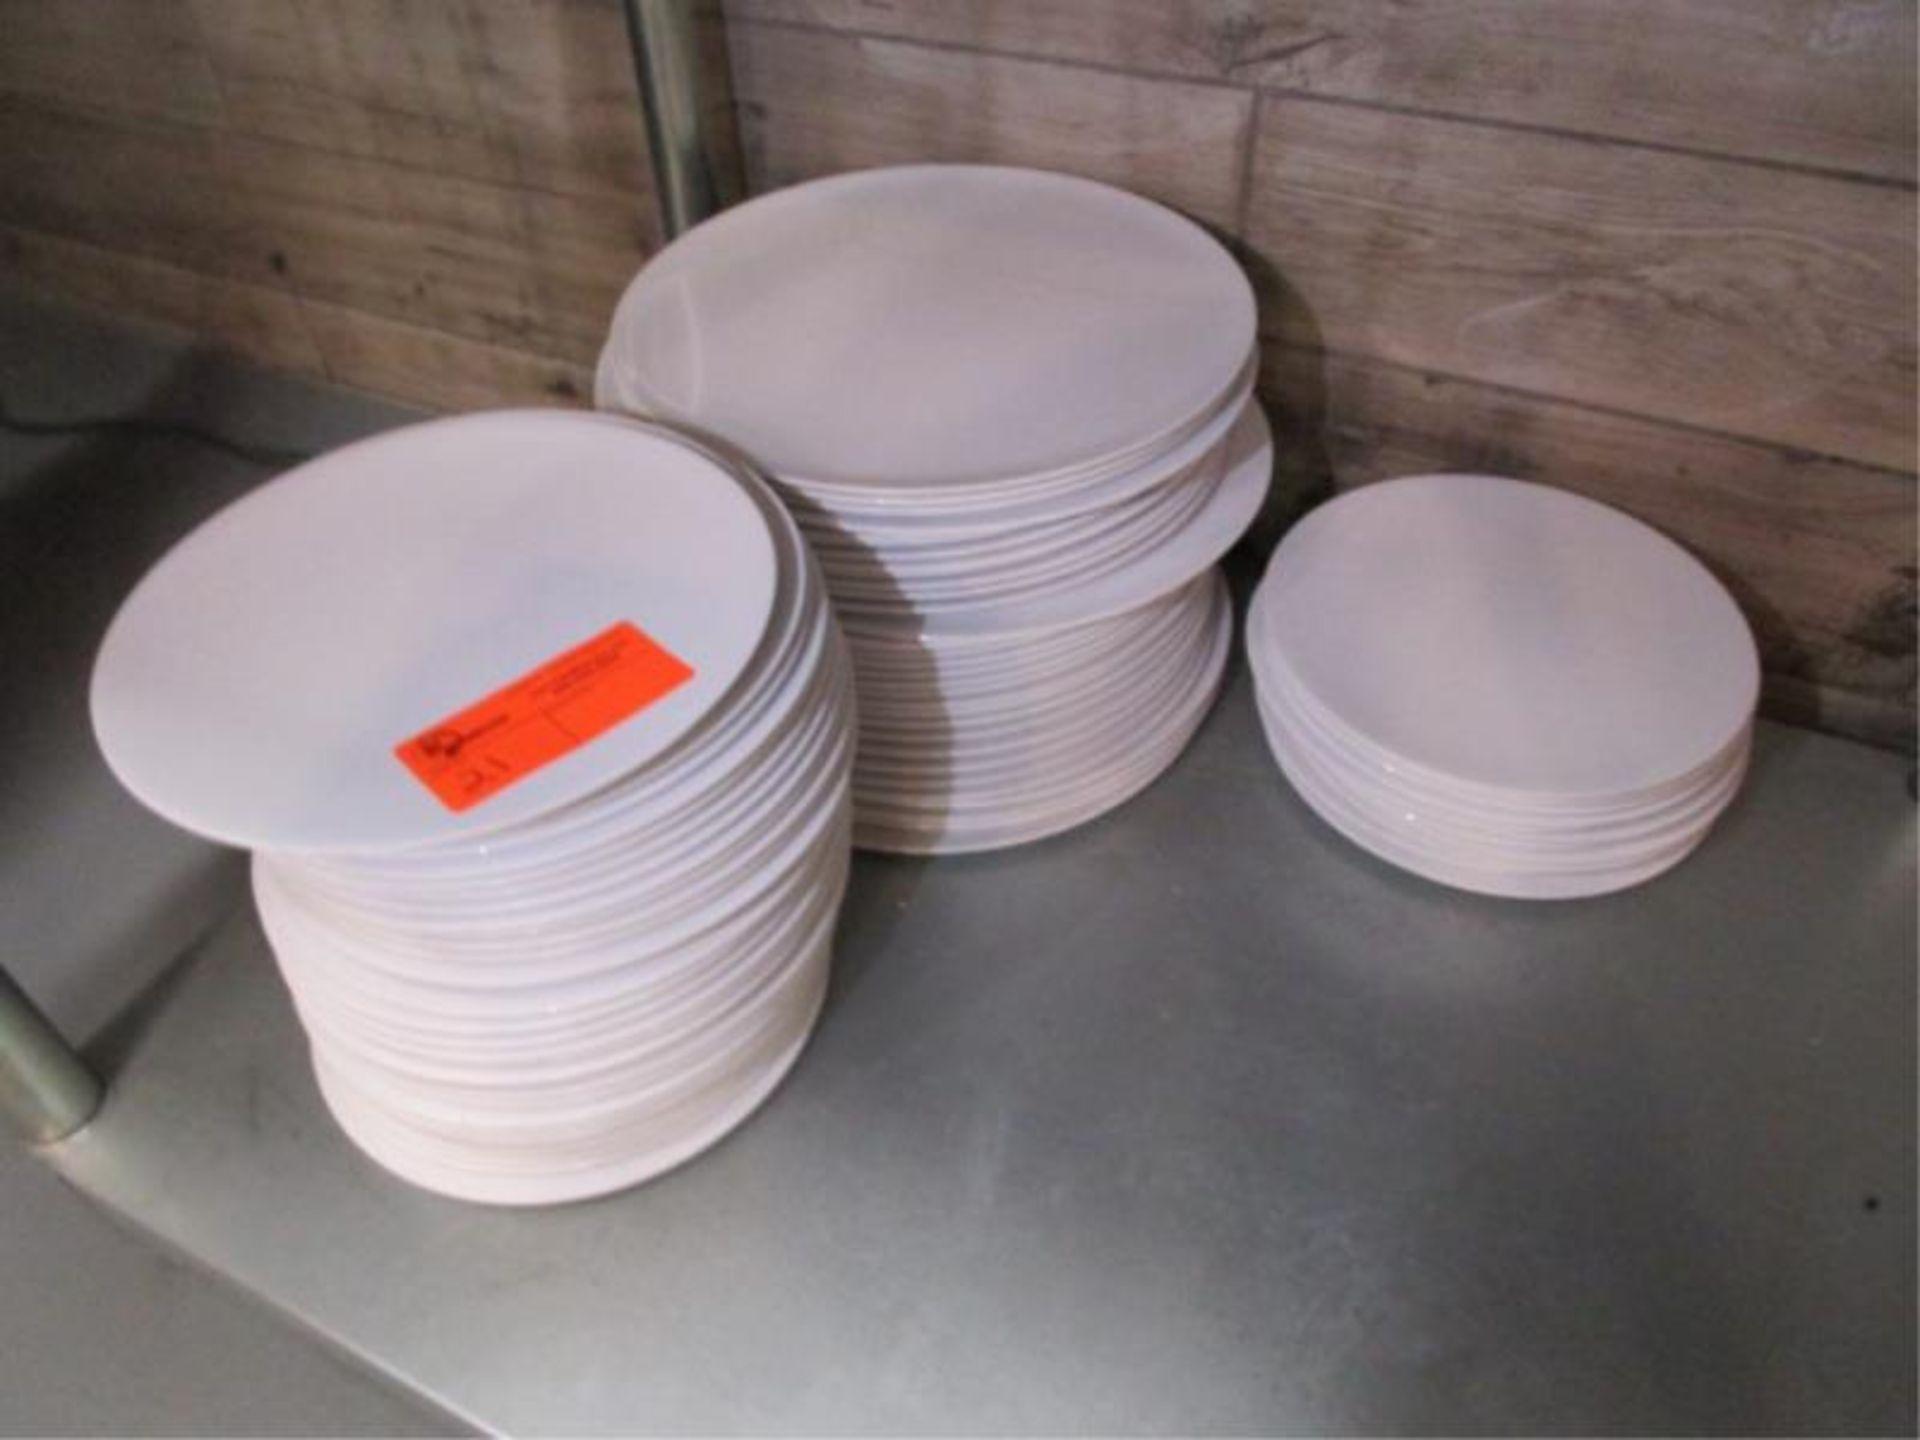 Lot 21 - Melamine White Plastic Plates by Yanco